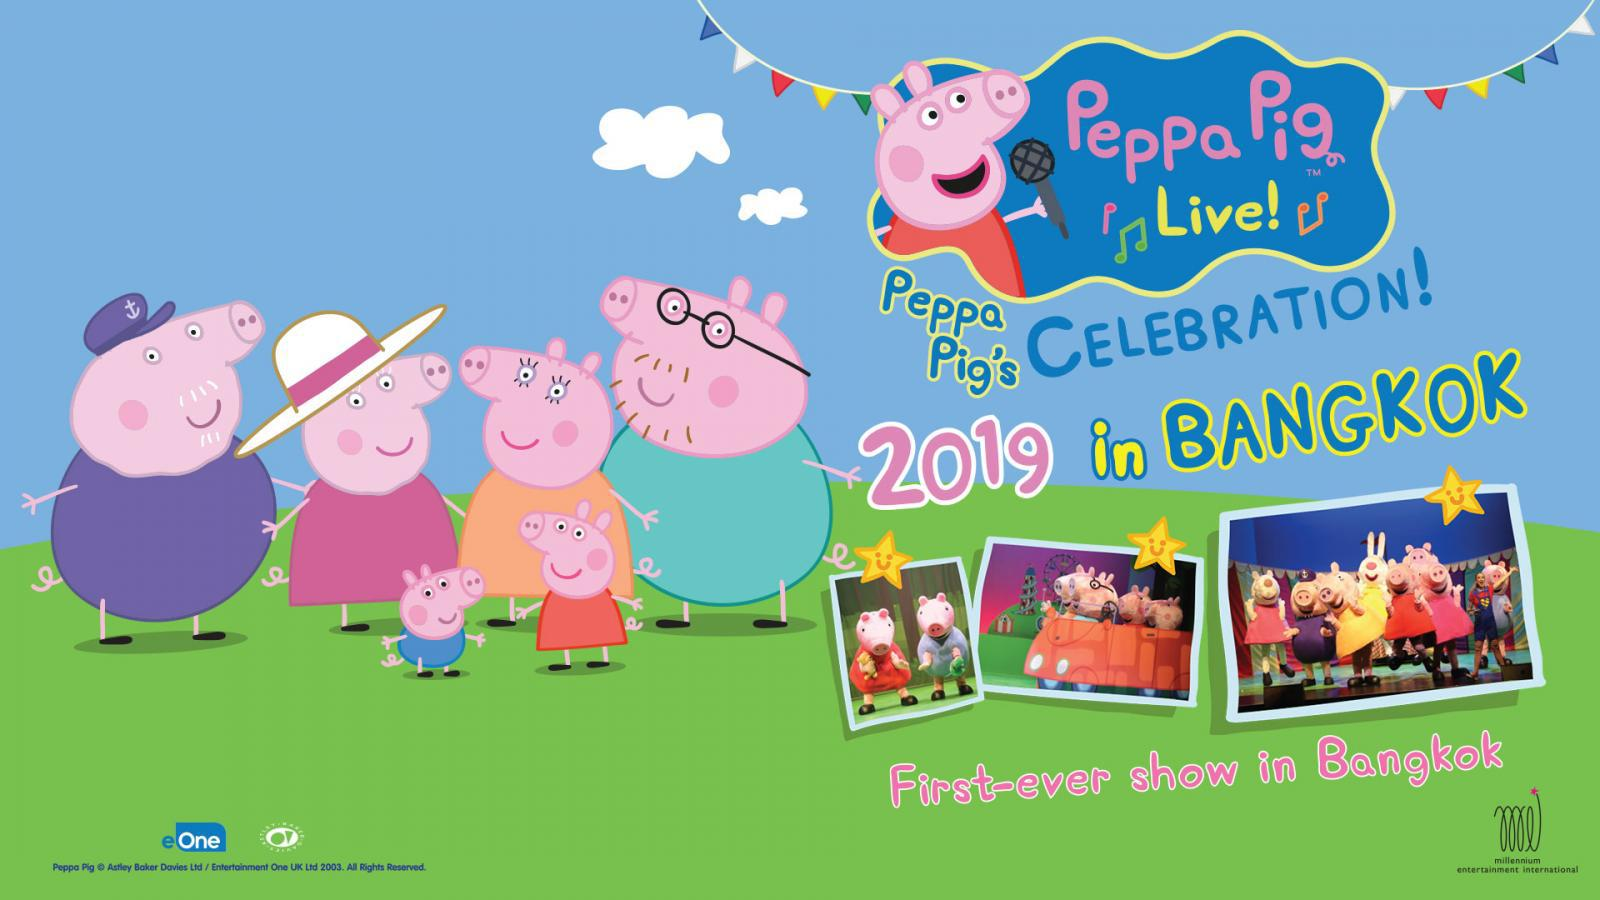 PEPPA PIG LIVE CELEBRATION 2019 IN BANGKOK